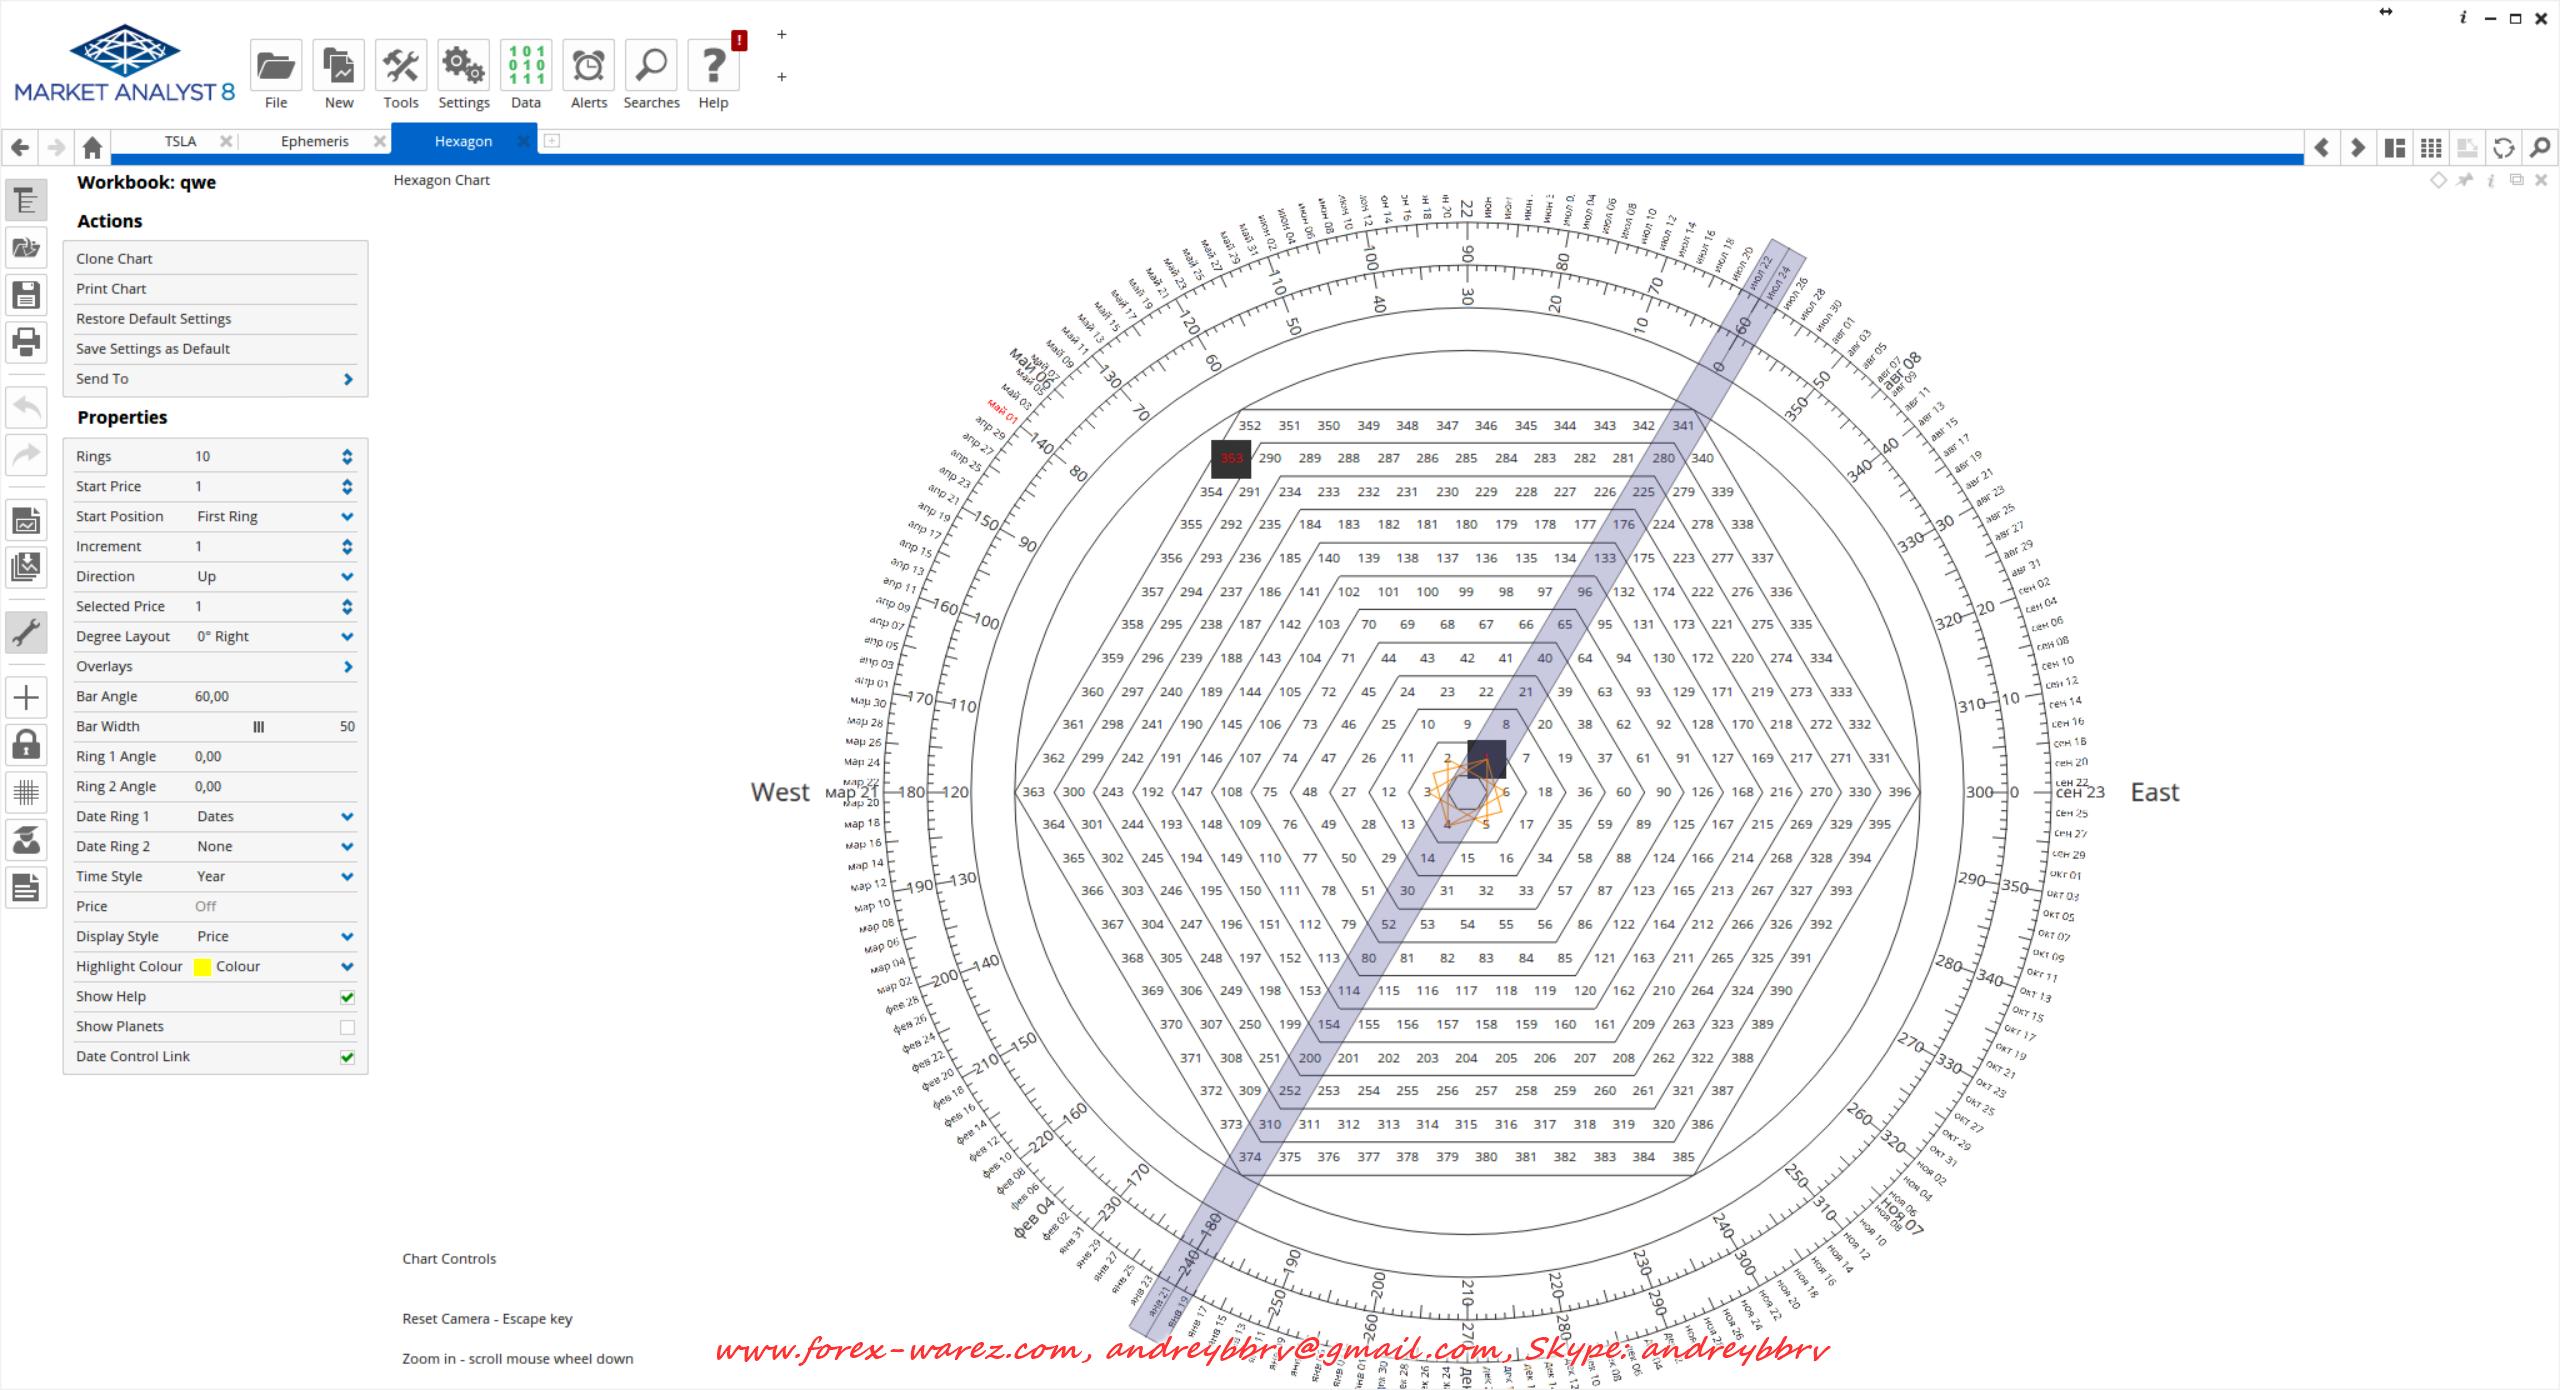 Screenshots/Market Analyst Professional v8 1 0 154 + Gann